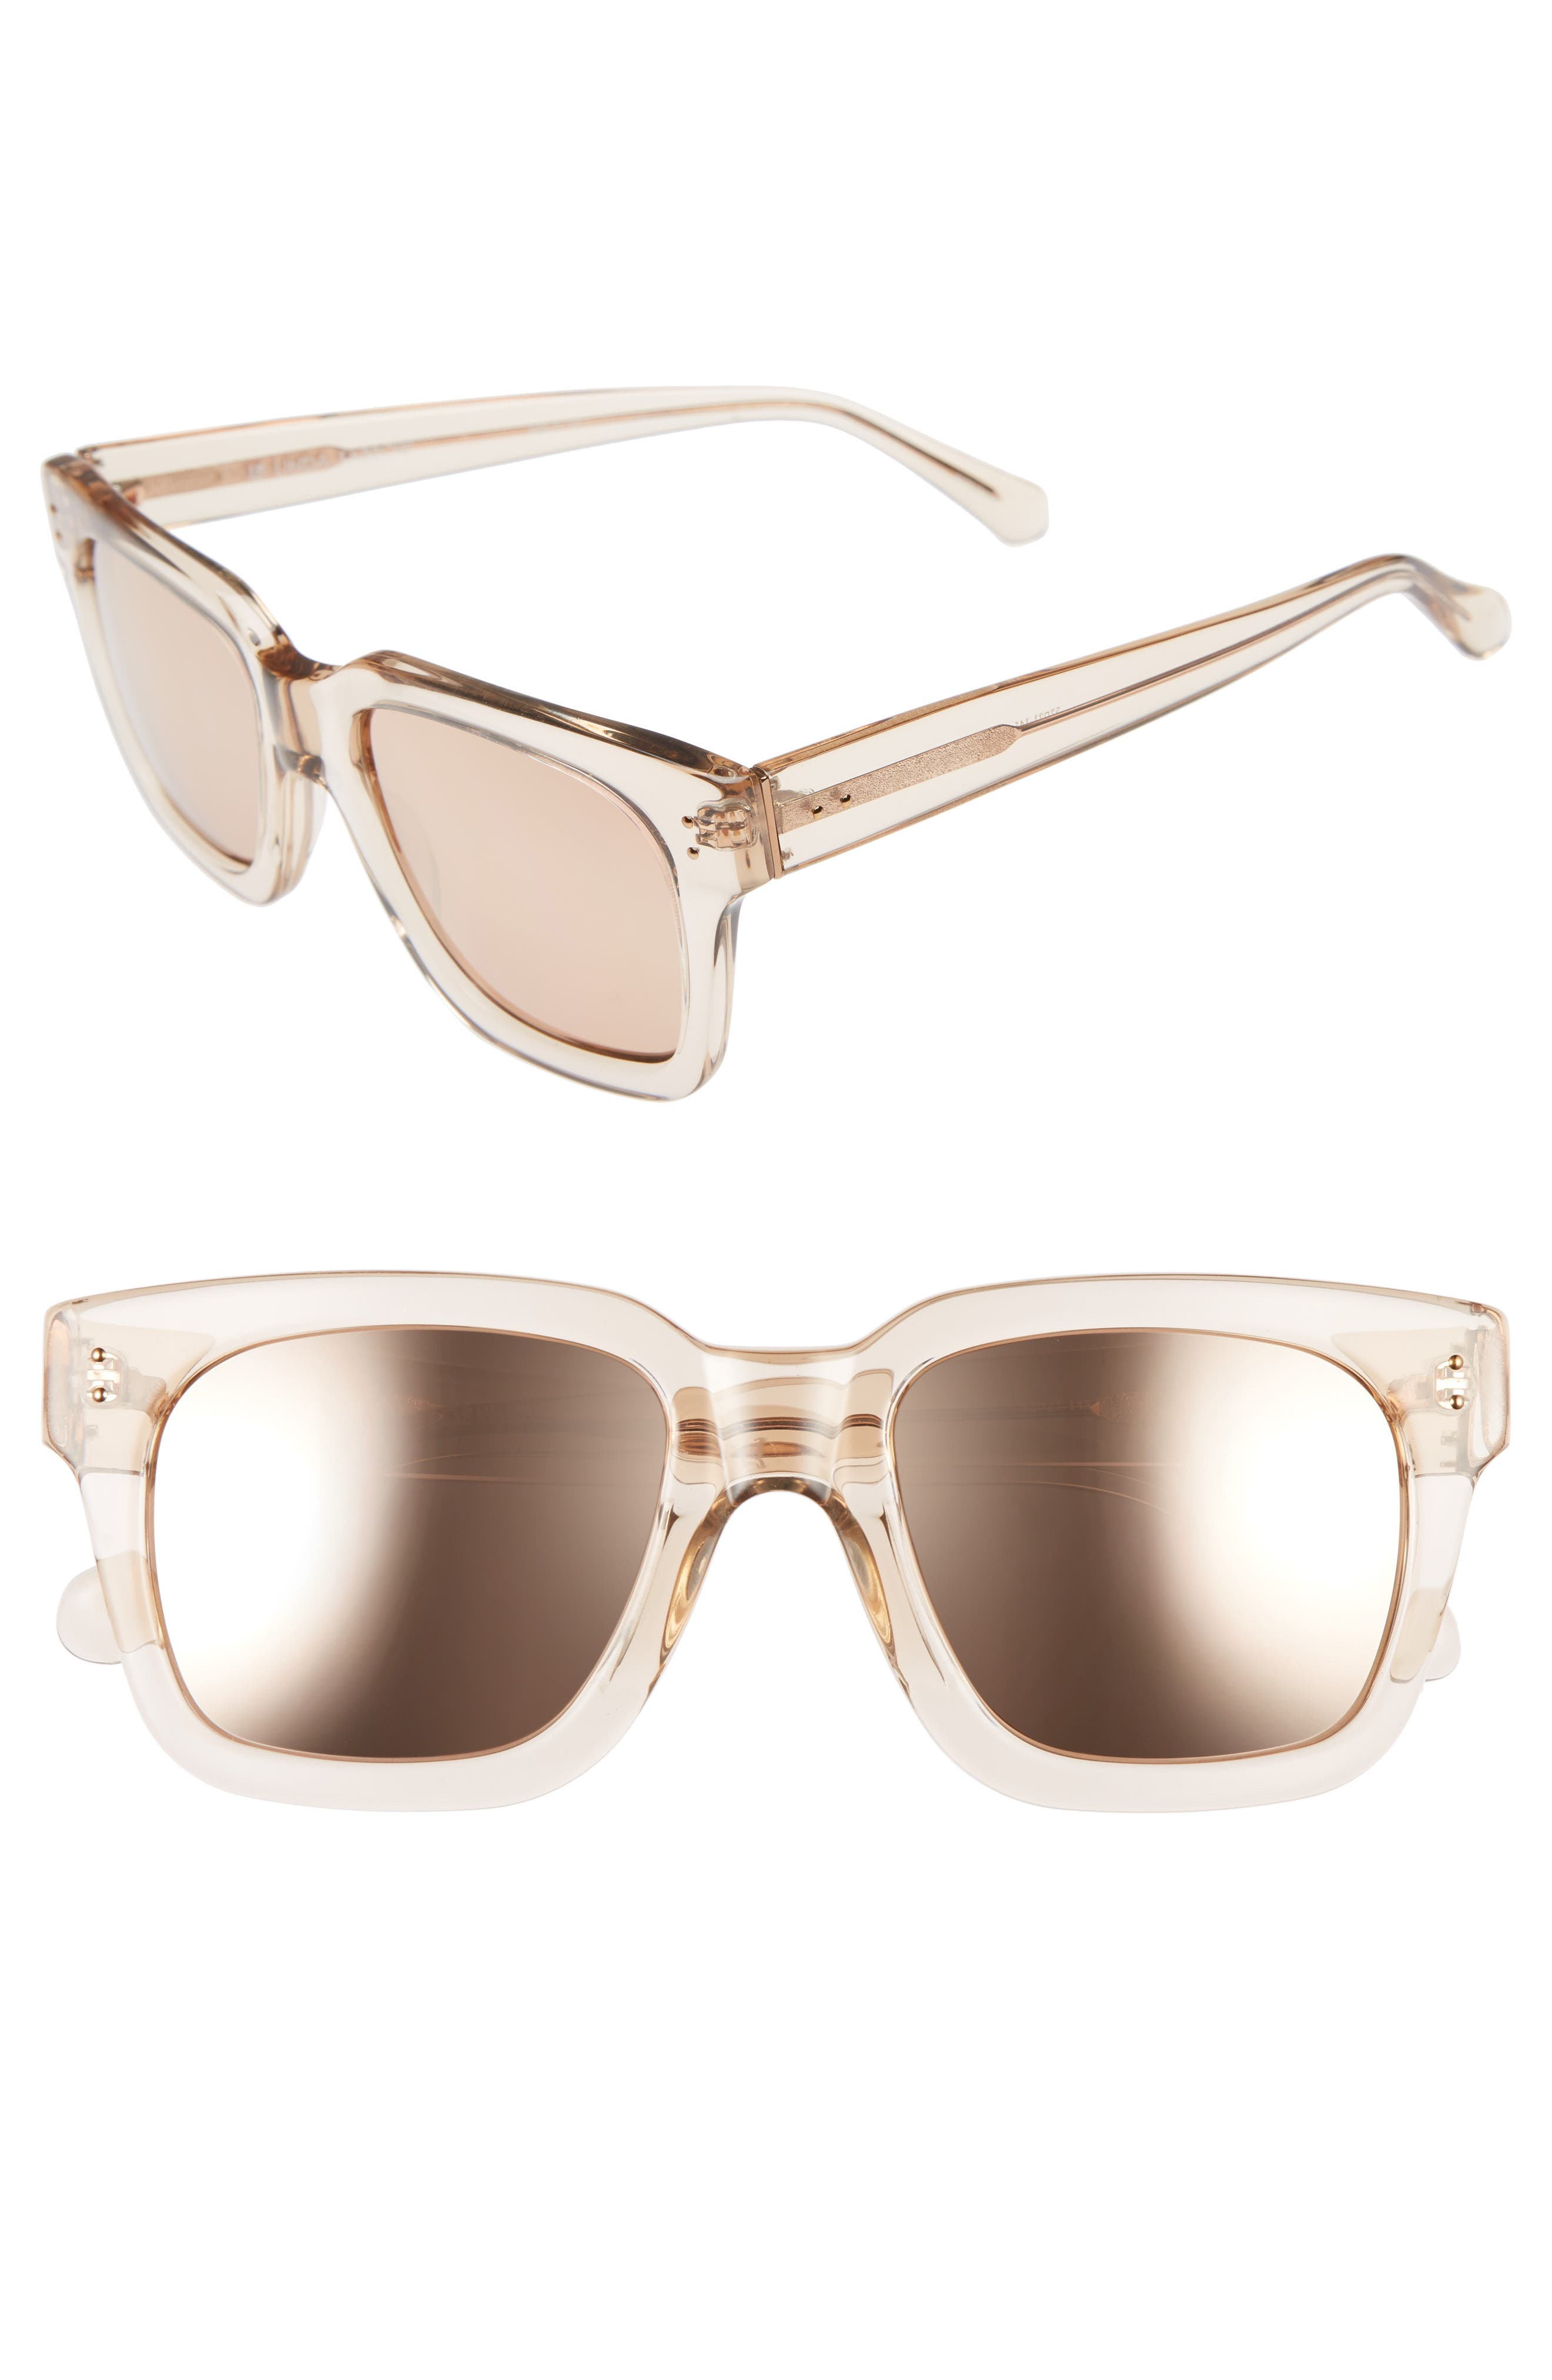 Alternate Image 1 Selected - Linda Farrow 50mm Sunglasses